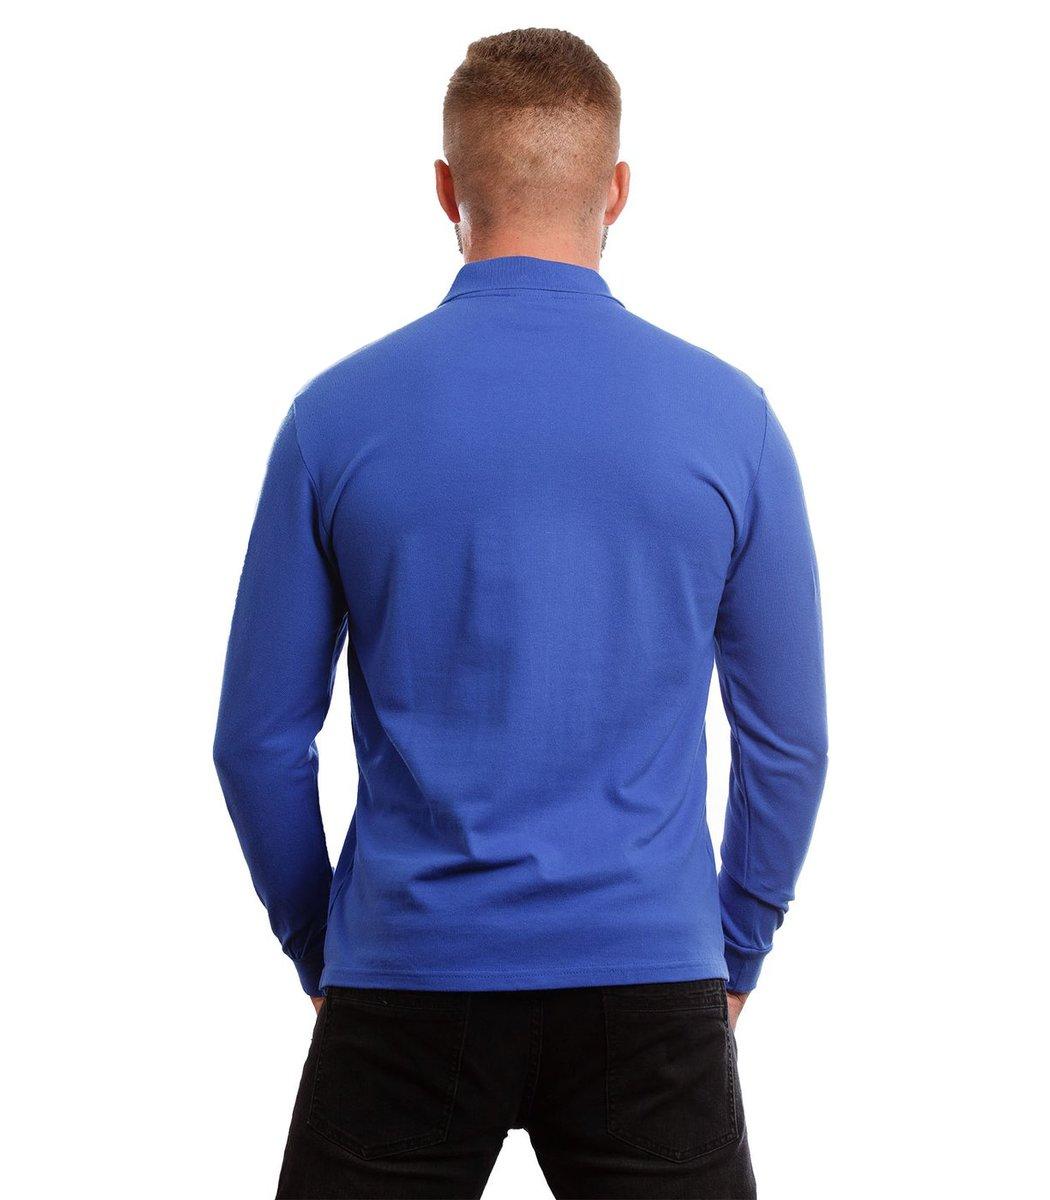 Поло с длинным рукавом Lacoste Classic (Синий) - Синий - Вид 5